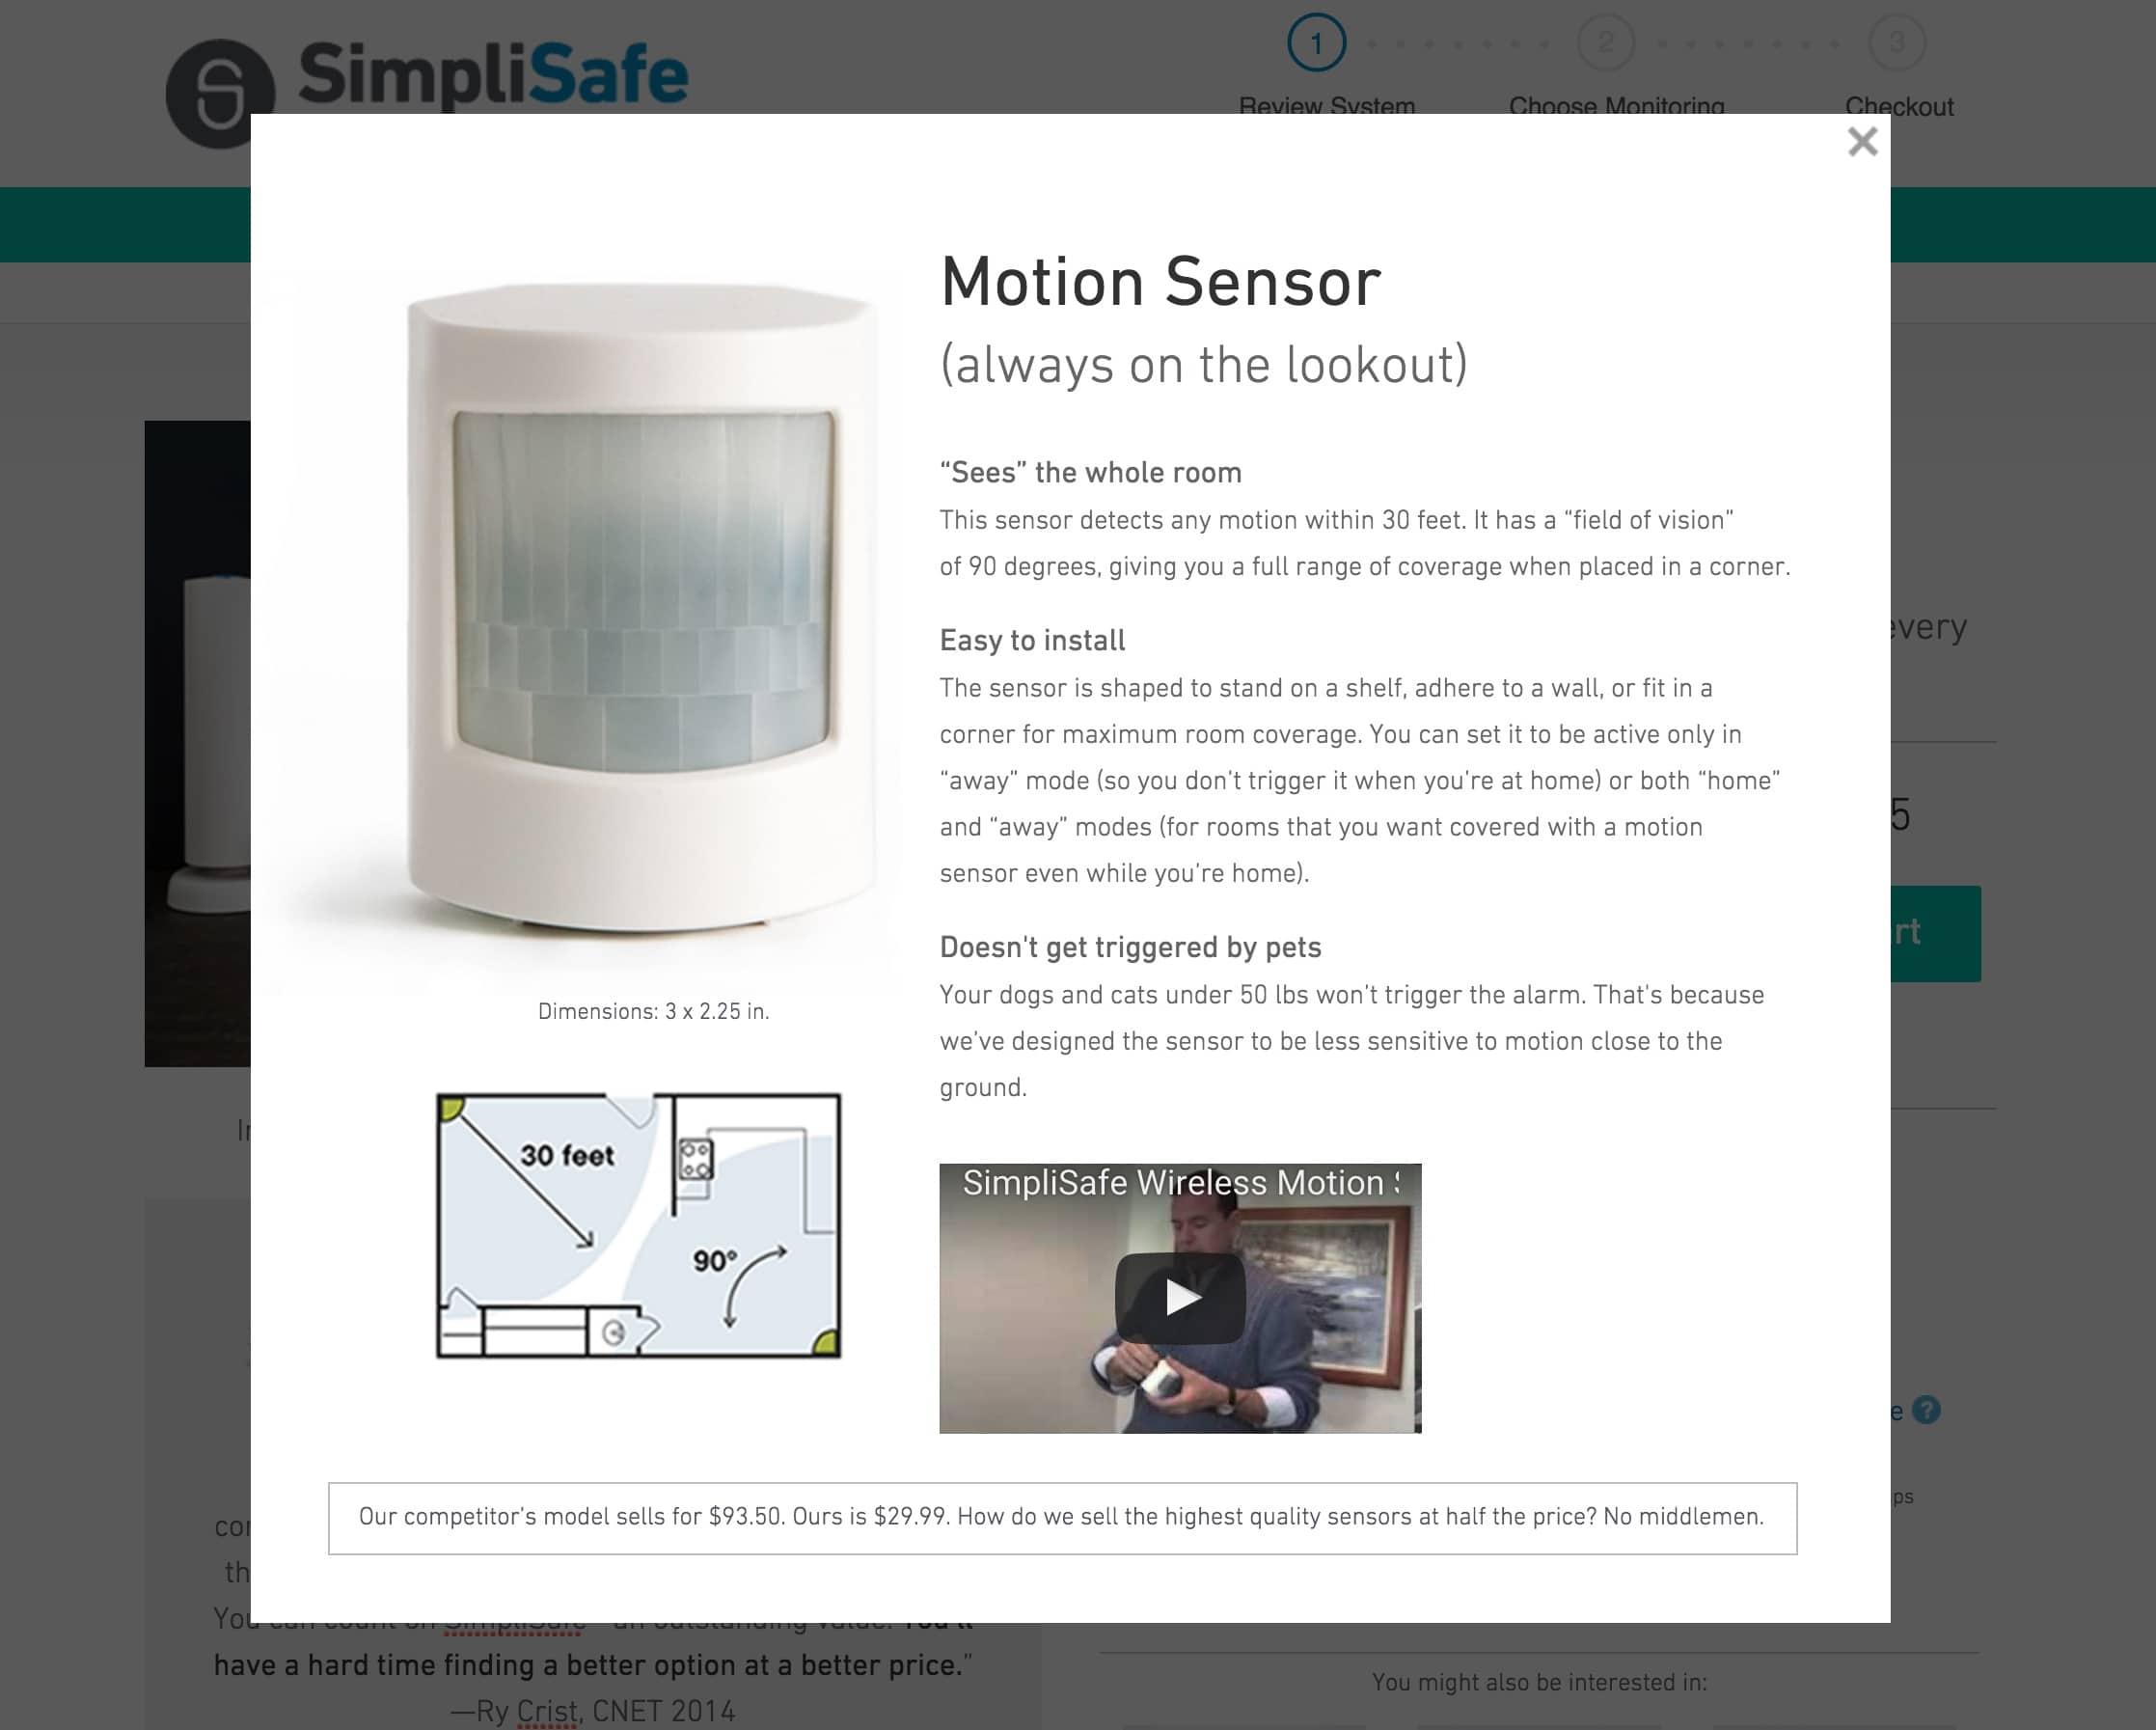 SimpliSafe's motion sensor